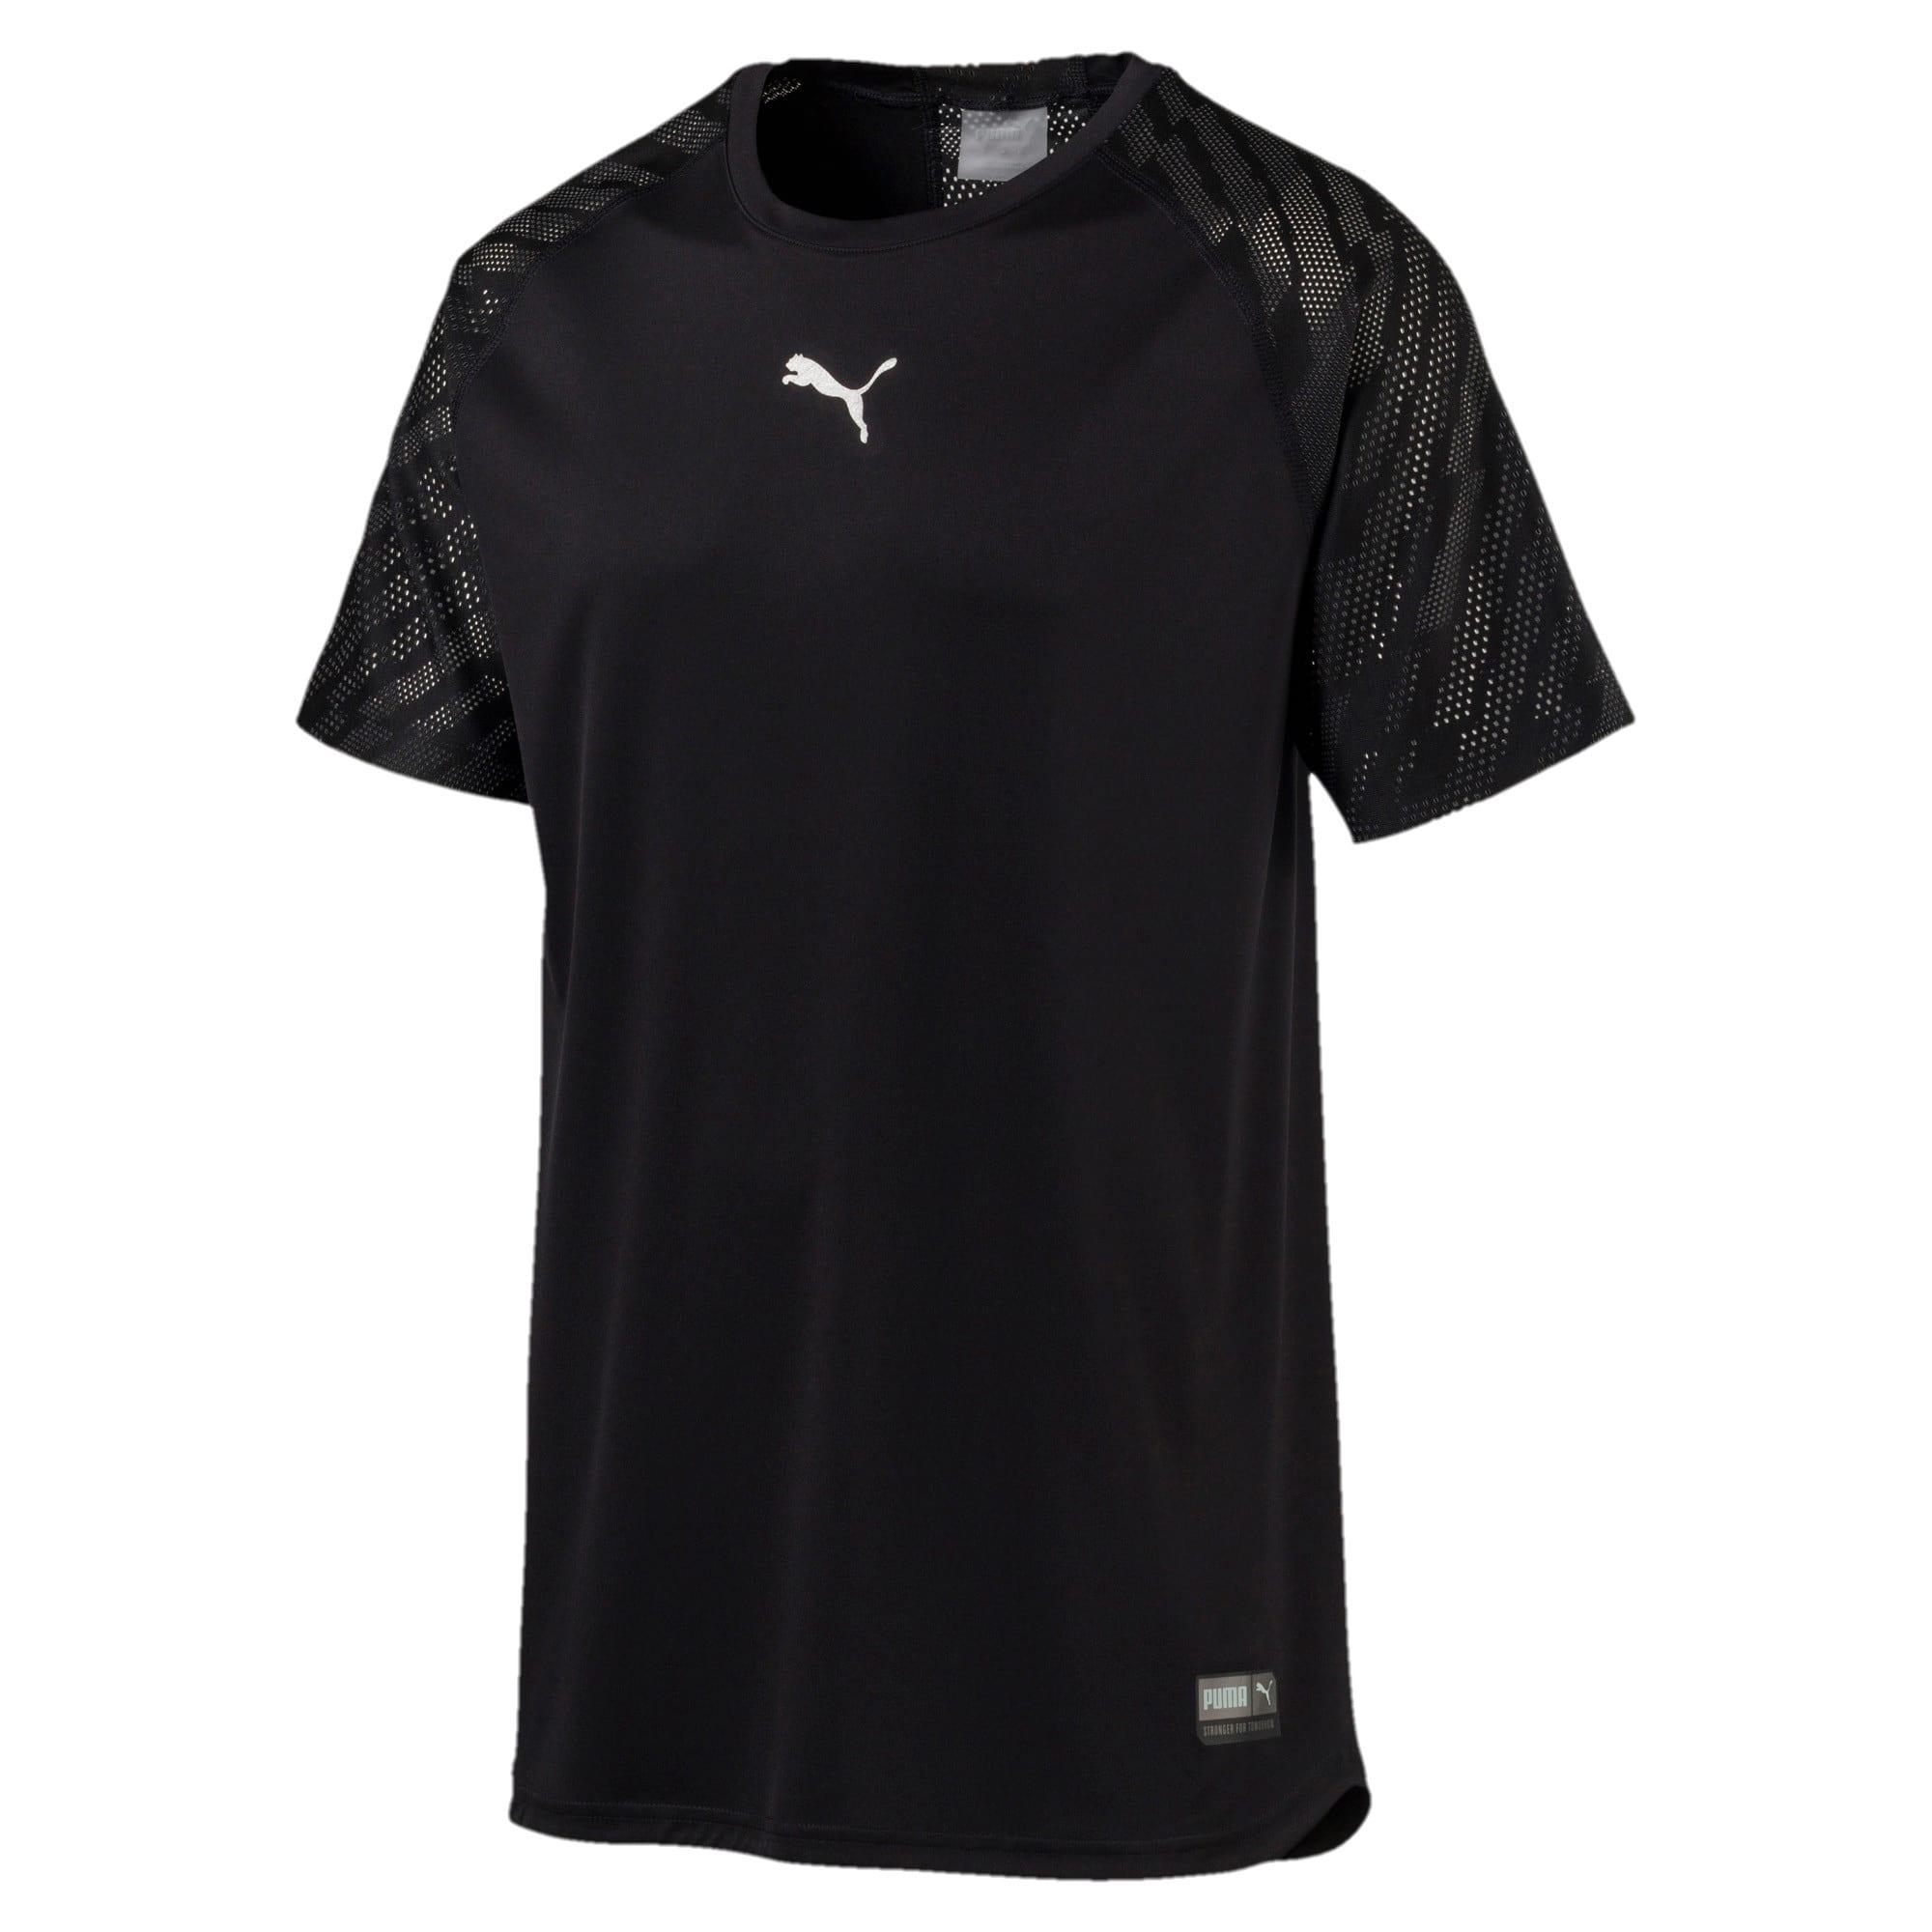 Thumbnail 5 of VENT Graphic Men's T-Shirt, Puma Black-iron gate, medium-IND